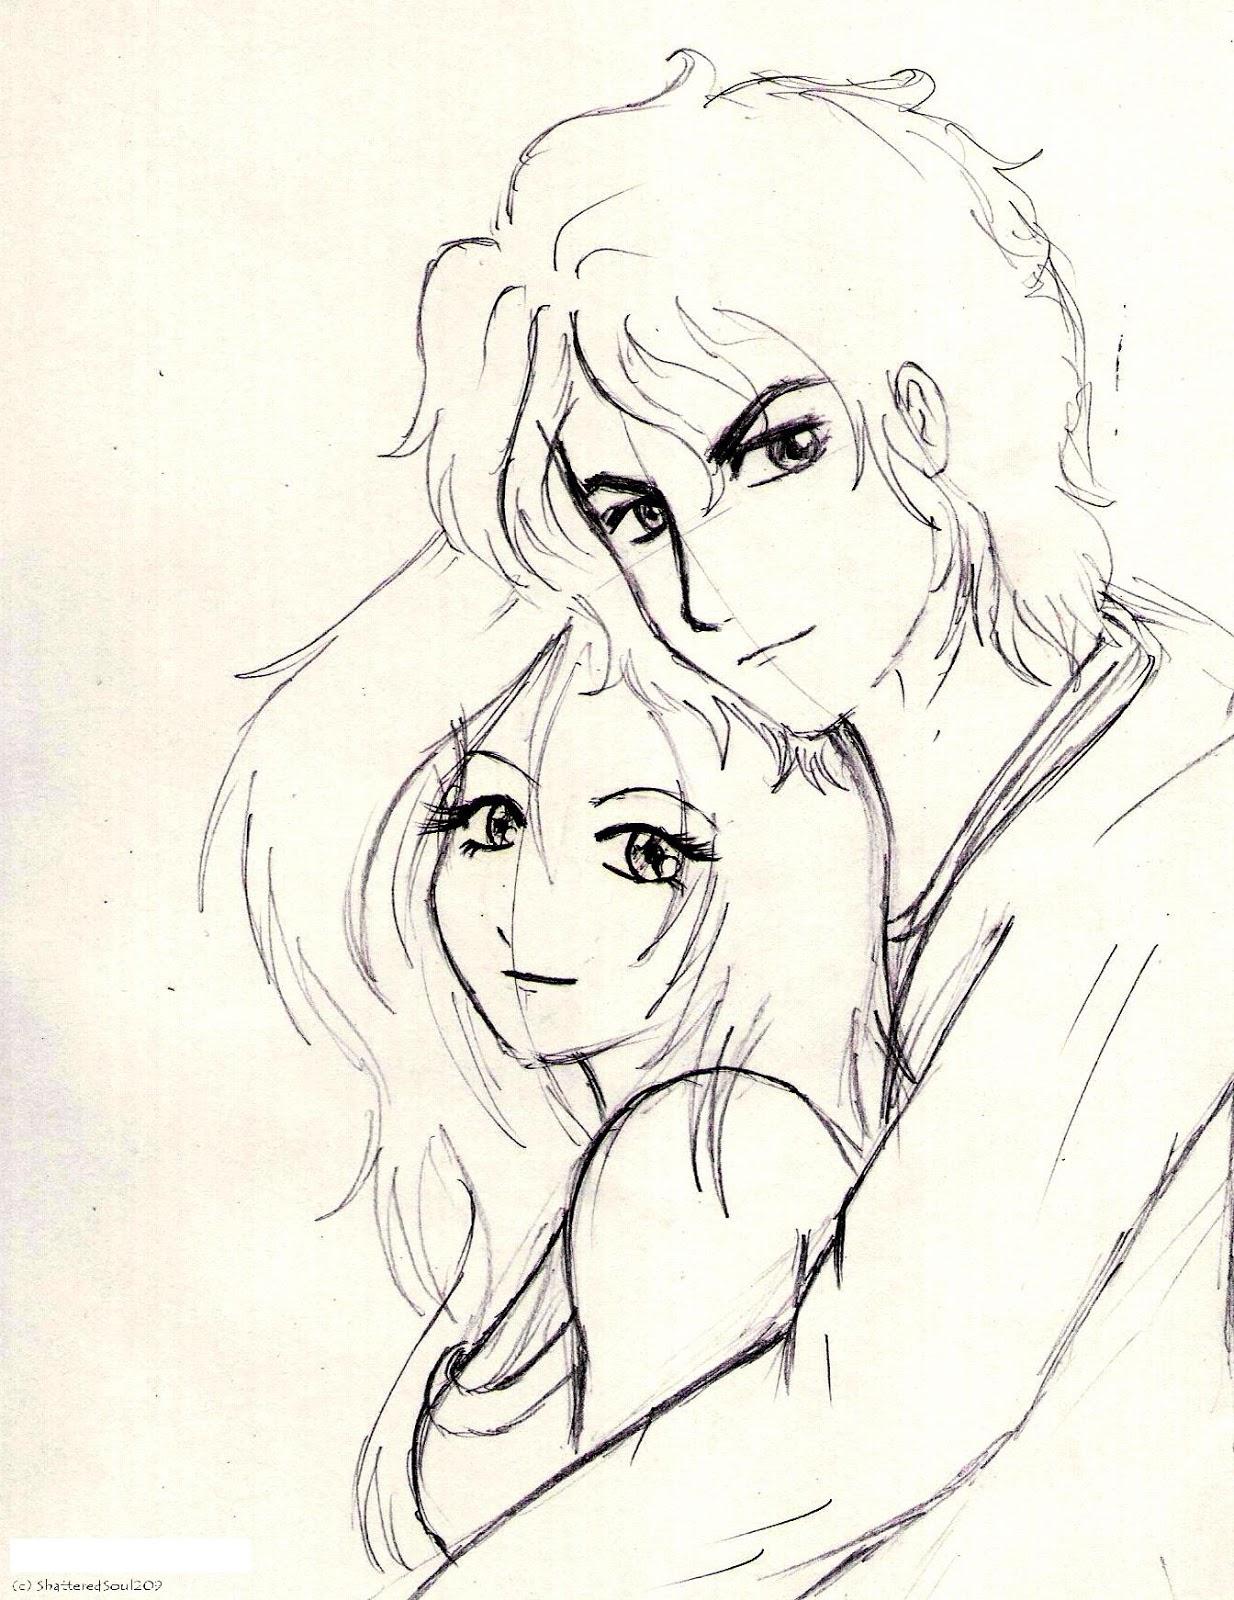 1234x1600 Color Pencil Sketch.of Love Couples